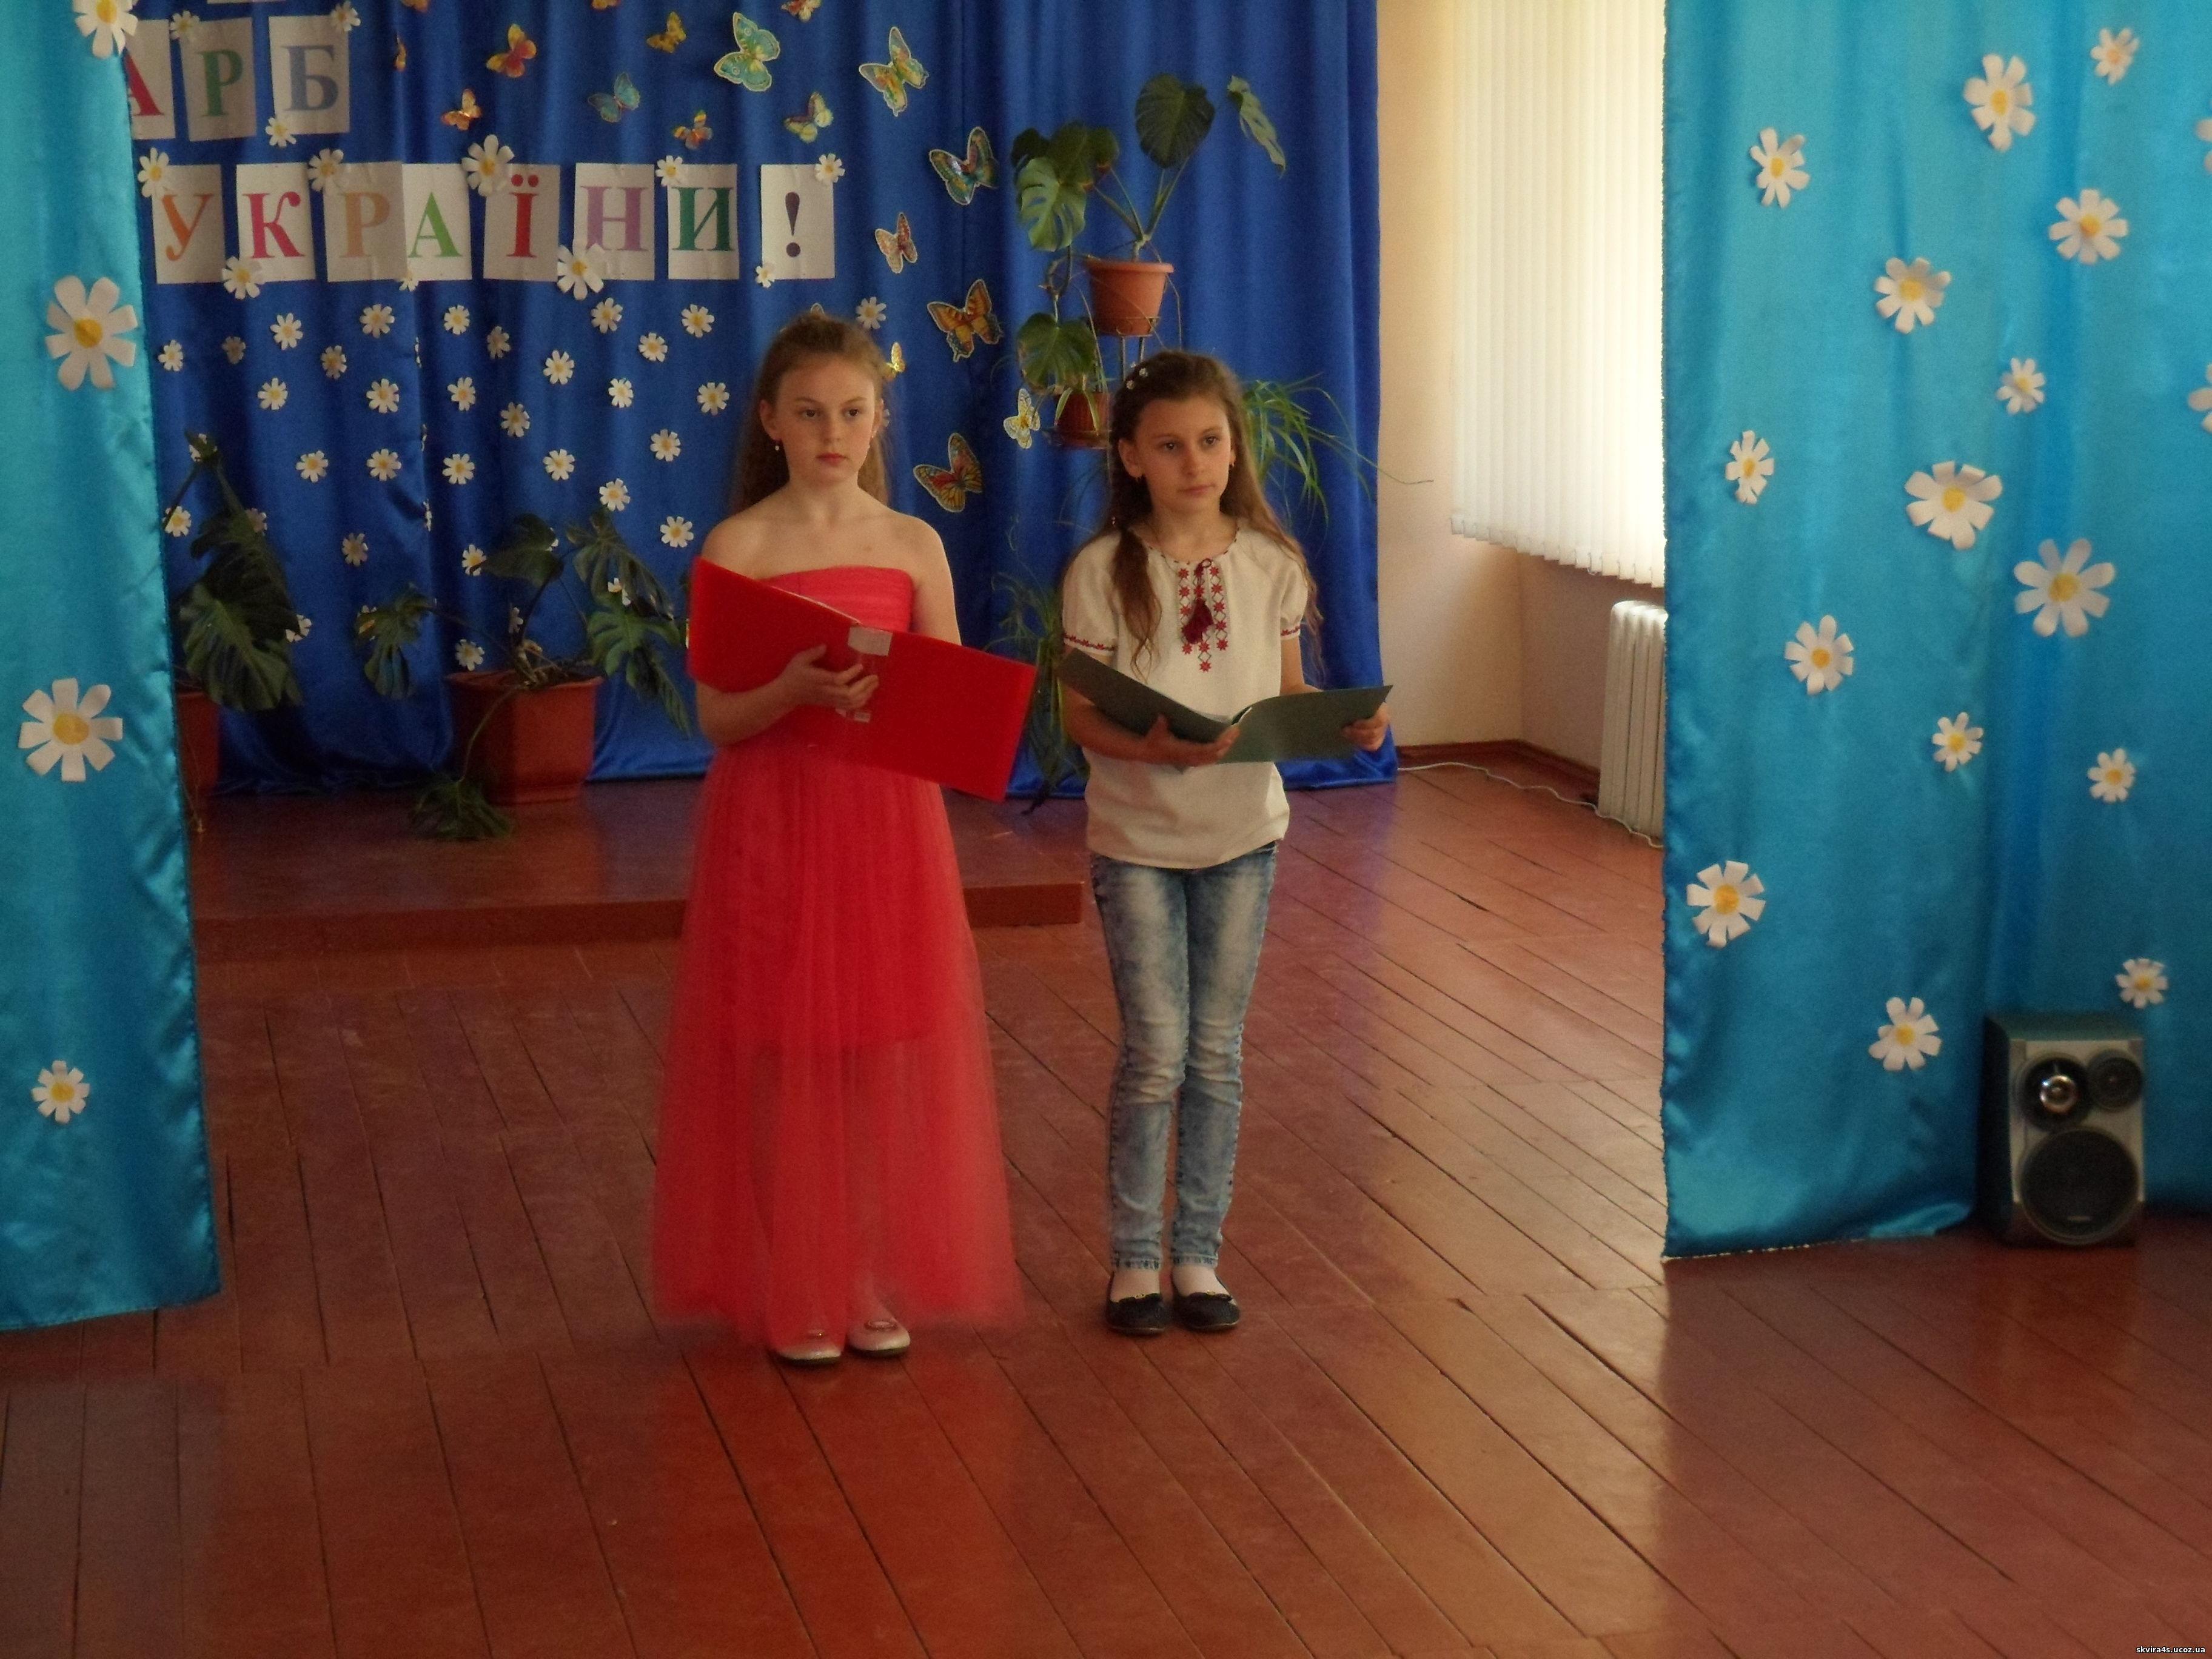 http://skvira4s.ucoz.ua/foto/15-05-17/SAM_5613.jpg